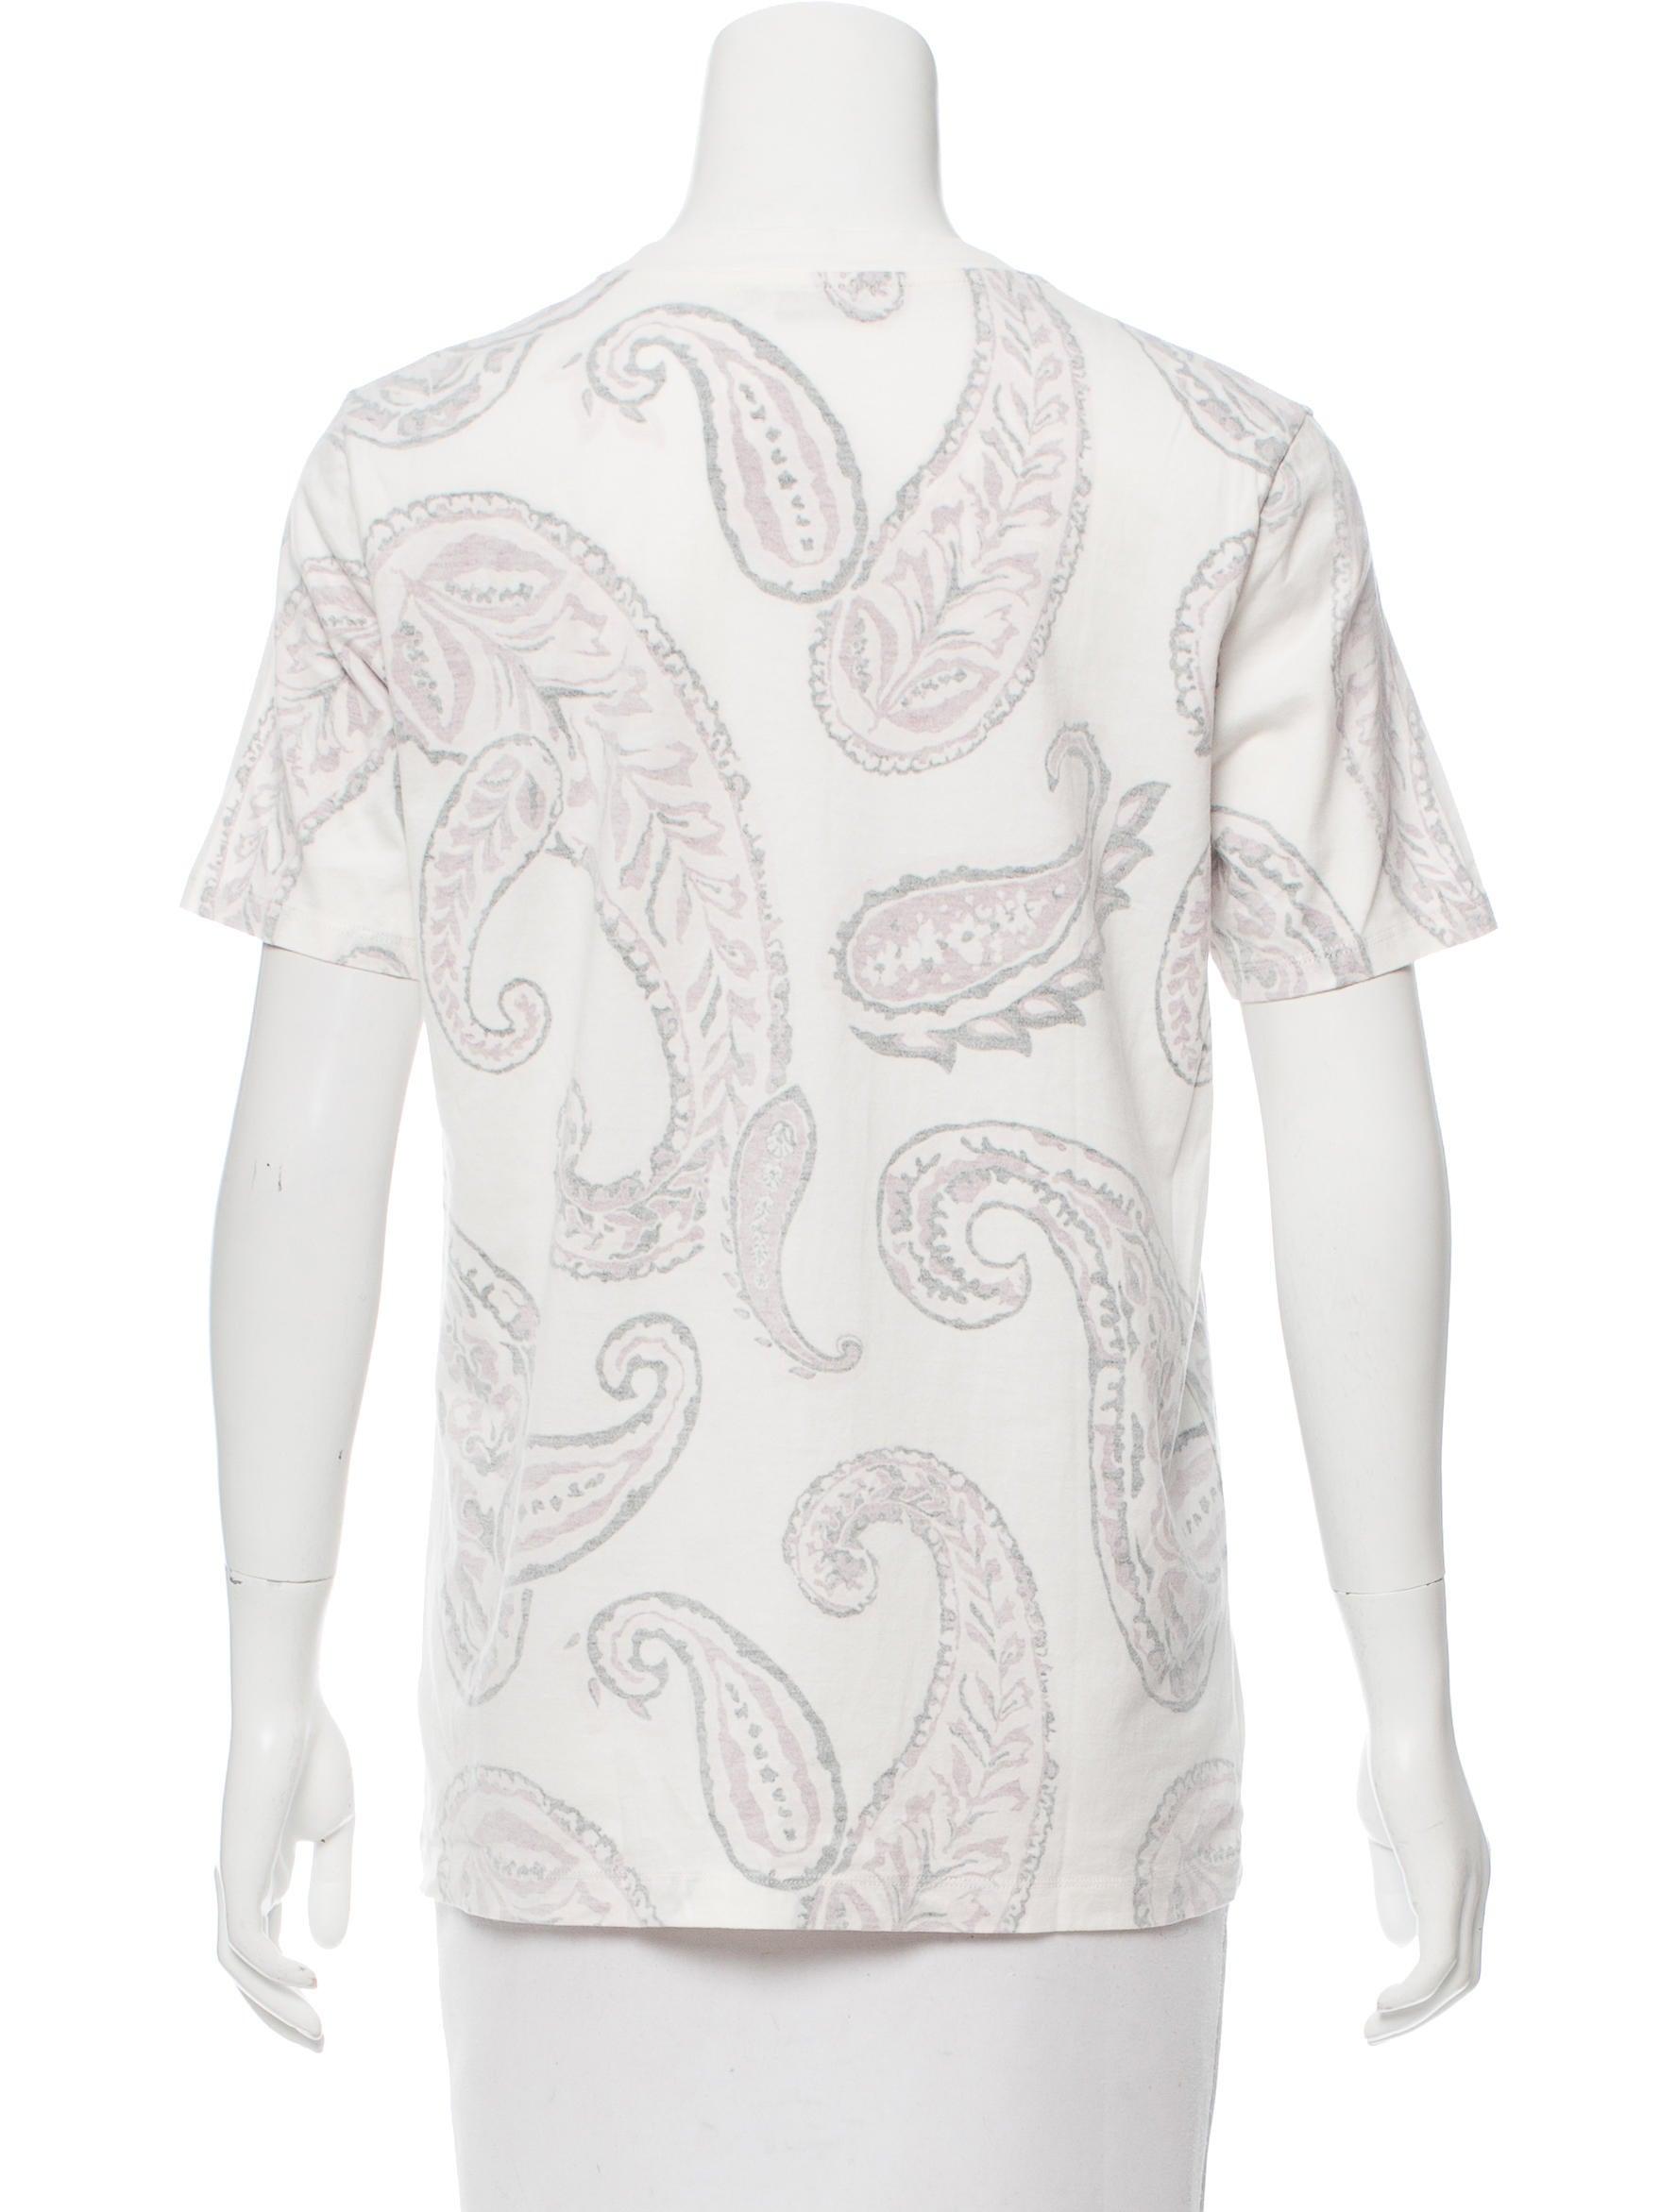 Acne Studios Paisley Print T Shirt Clothing Acn30068